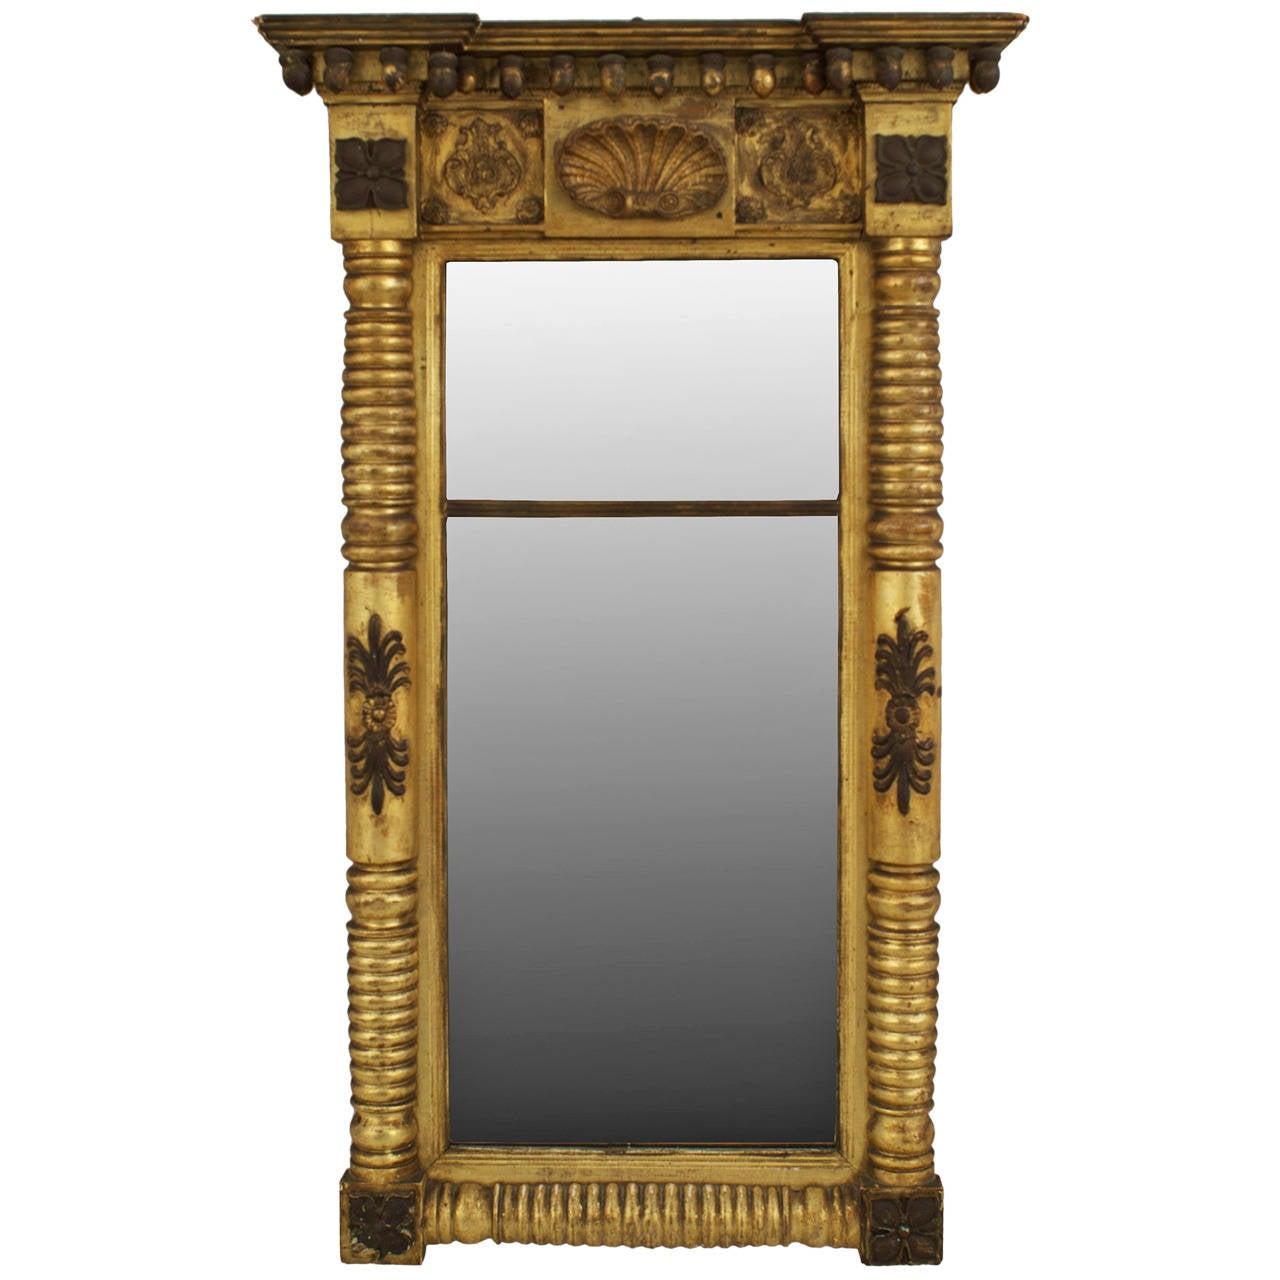 19th Century American Empire Ebonized and Giltwood Pier Mirror